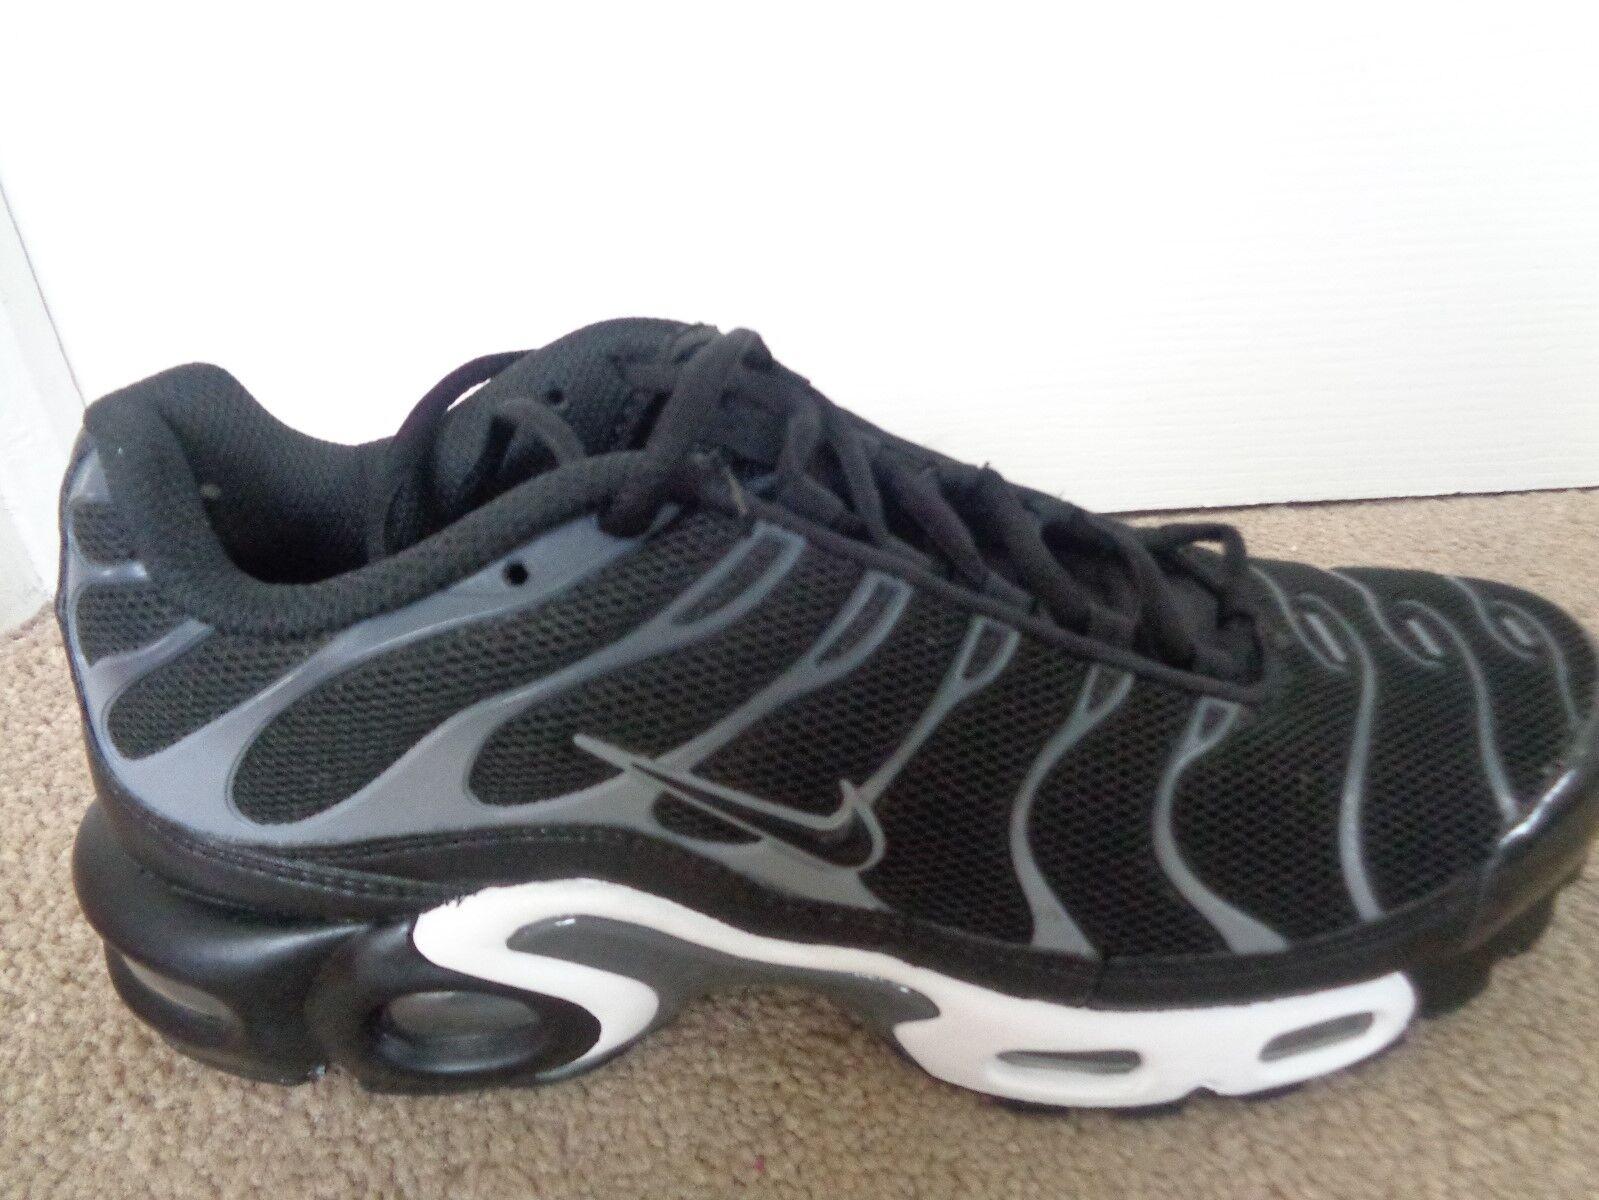 Nike Nike Nike Air Max Plus TXT   Ginnastica 647315 002 EU 40   7 Nuovo + Scatola 905757